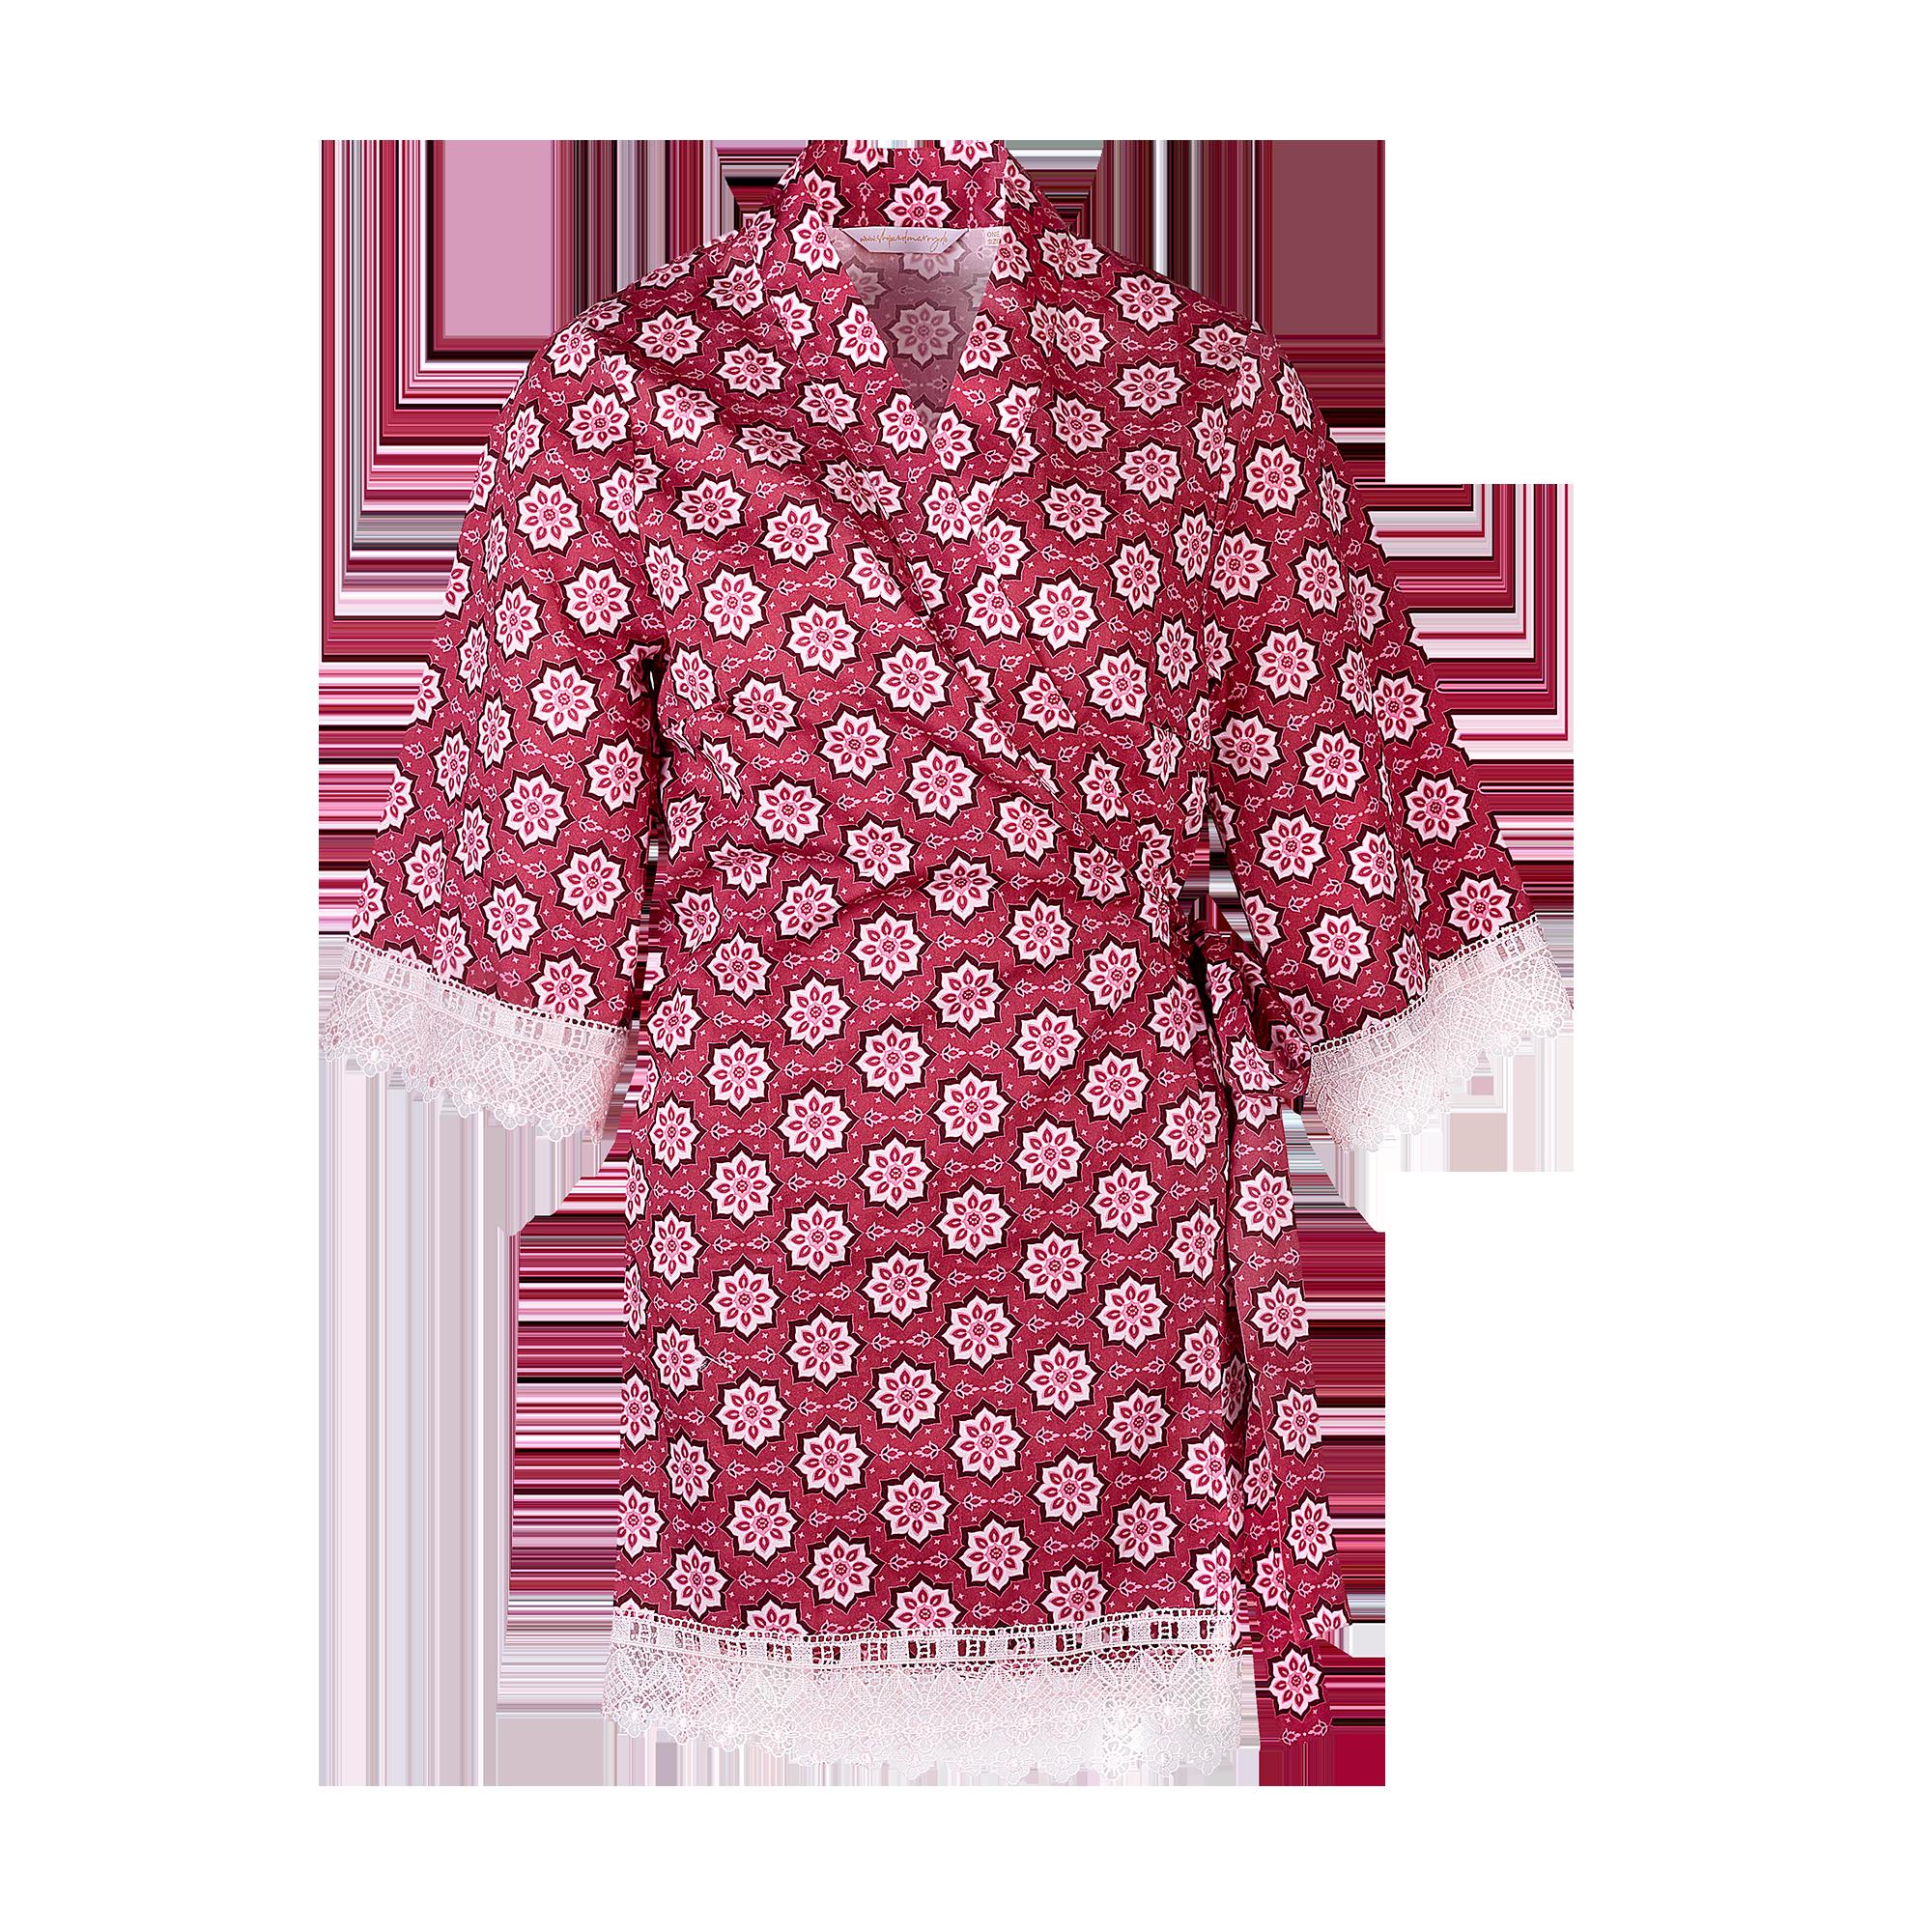 Kimono Brautjungfer | Getting ready | personalisierbar